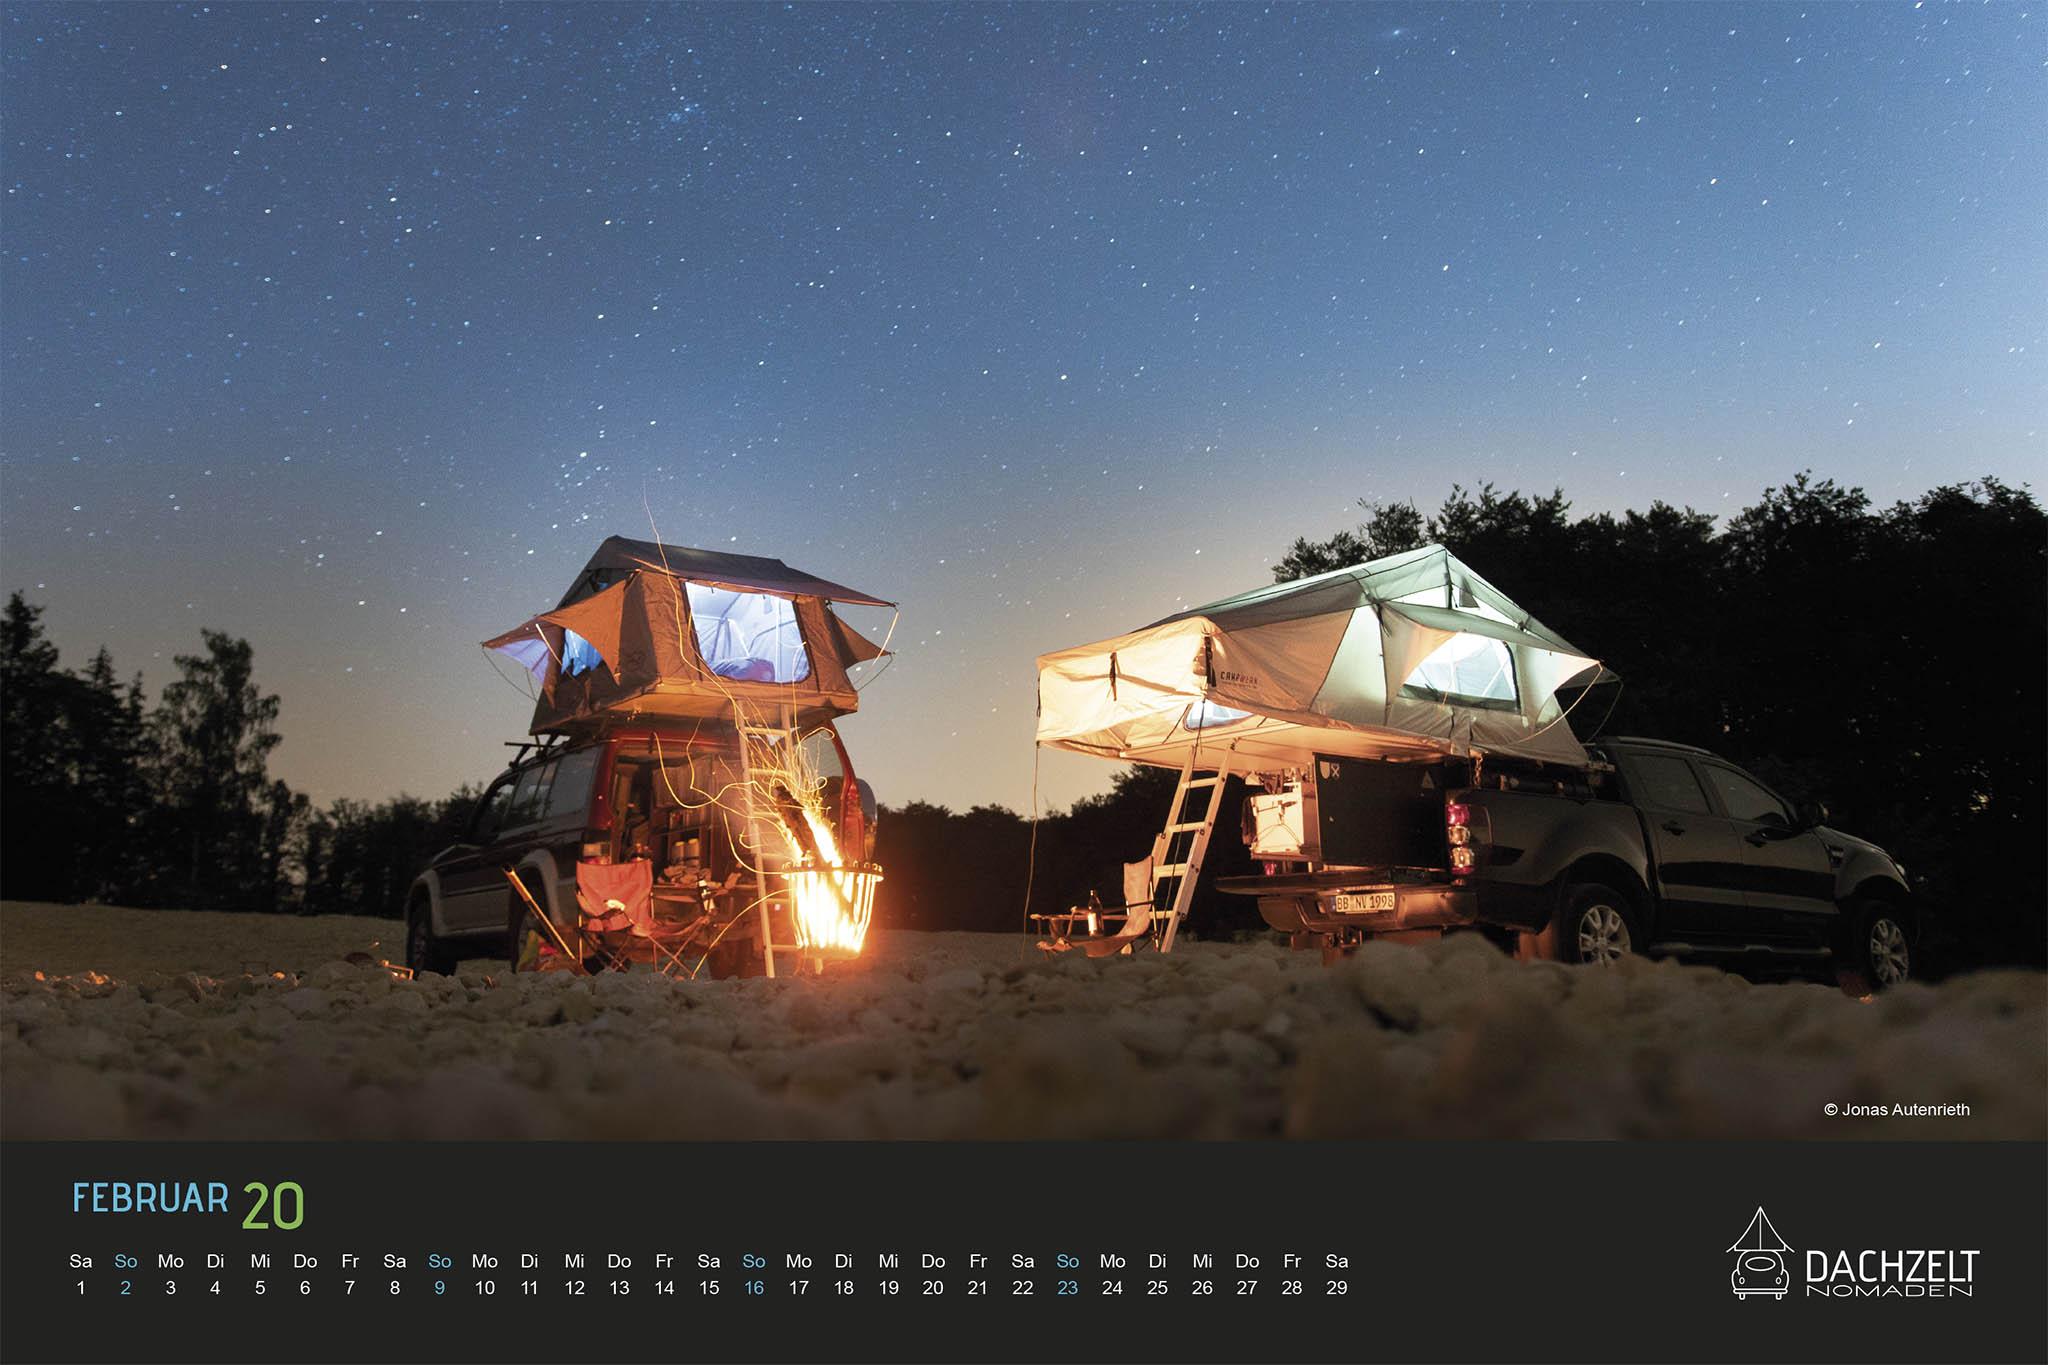 Dachzeltnomaden-Dachzelt-Kalender-2020-Februar.jpg